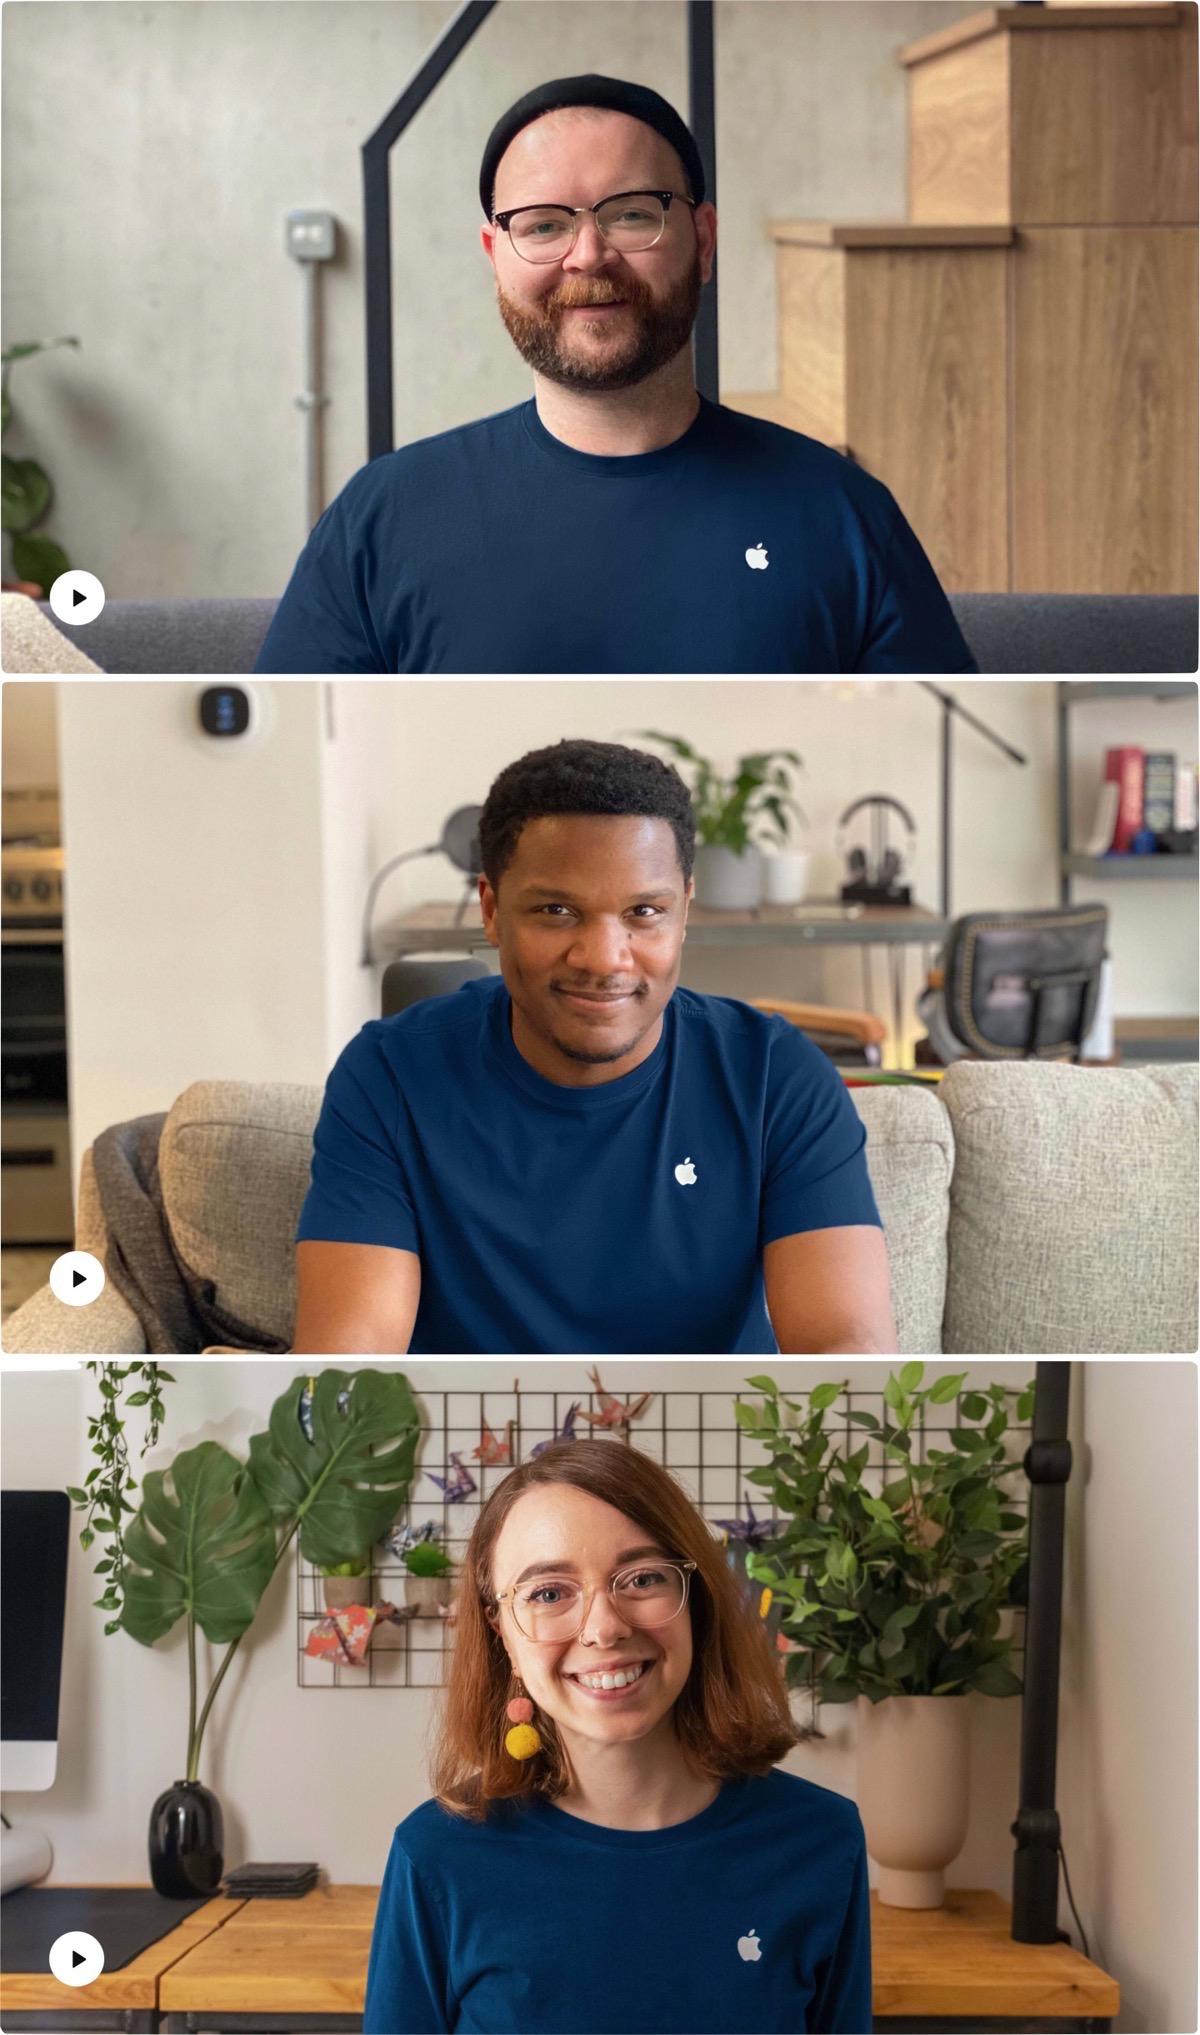 Image of three apple retail employees